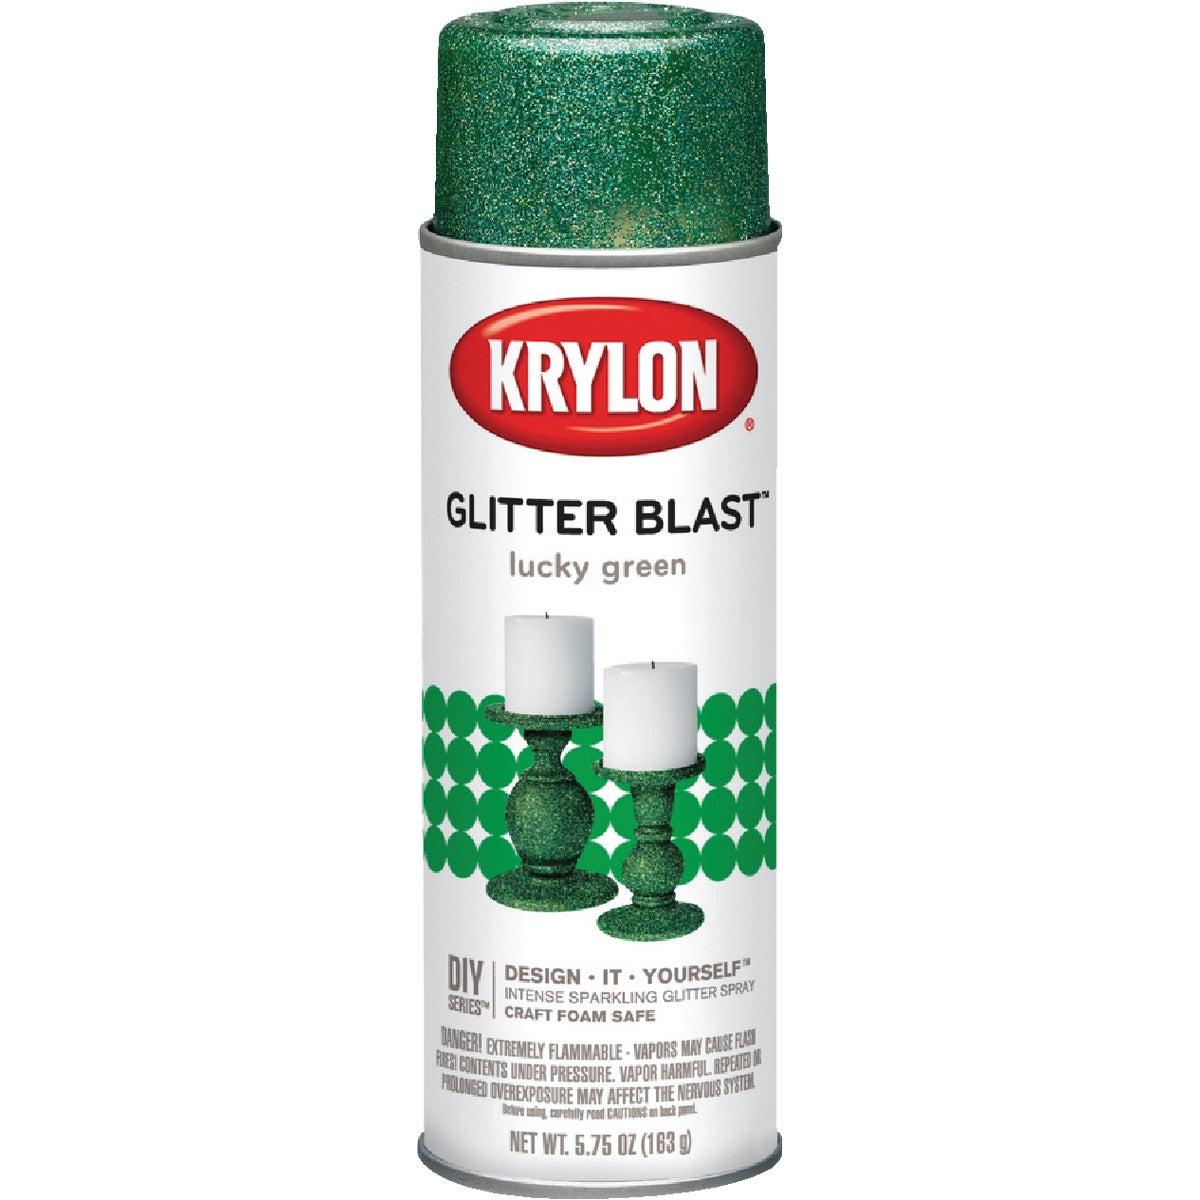 LUCKY GRN GLITTER SPRAY - K03809000 by Krylon/consumer Div